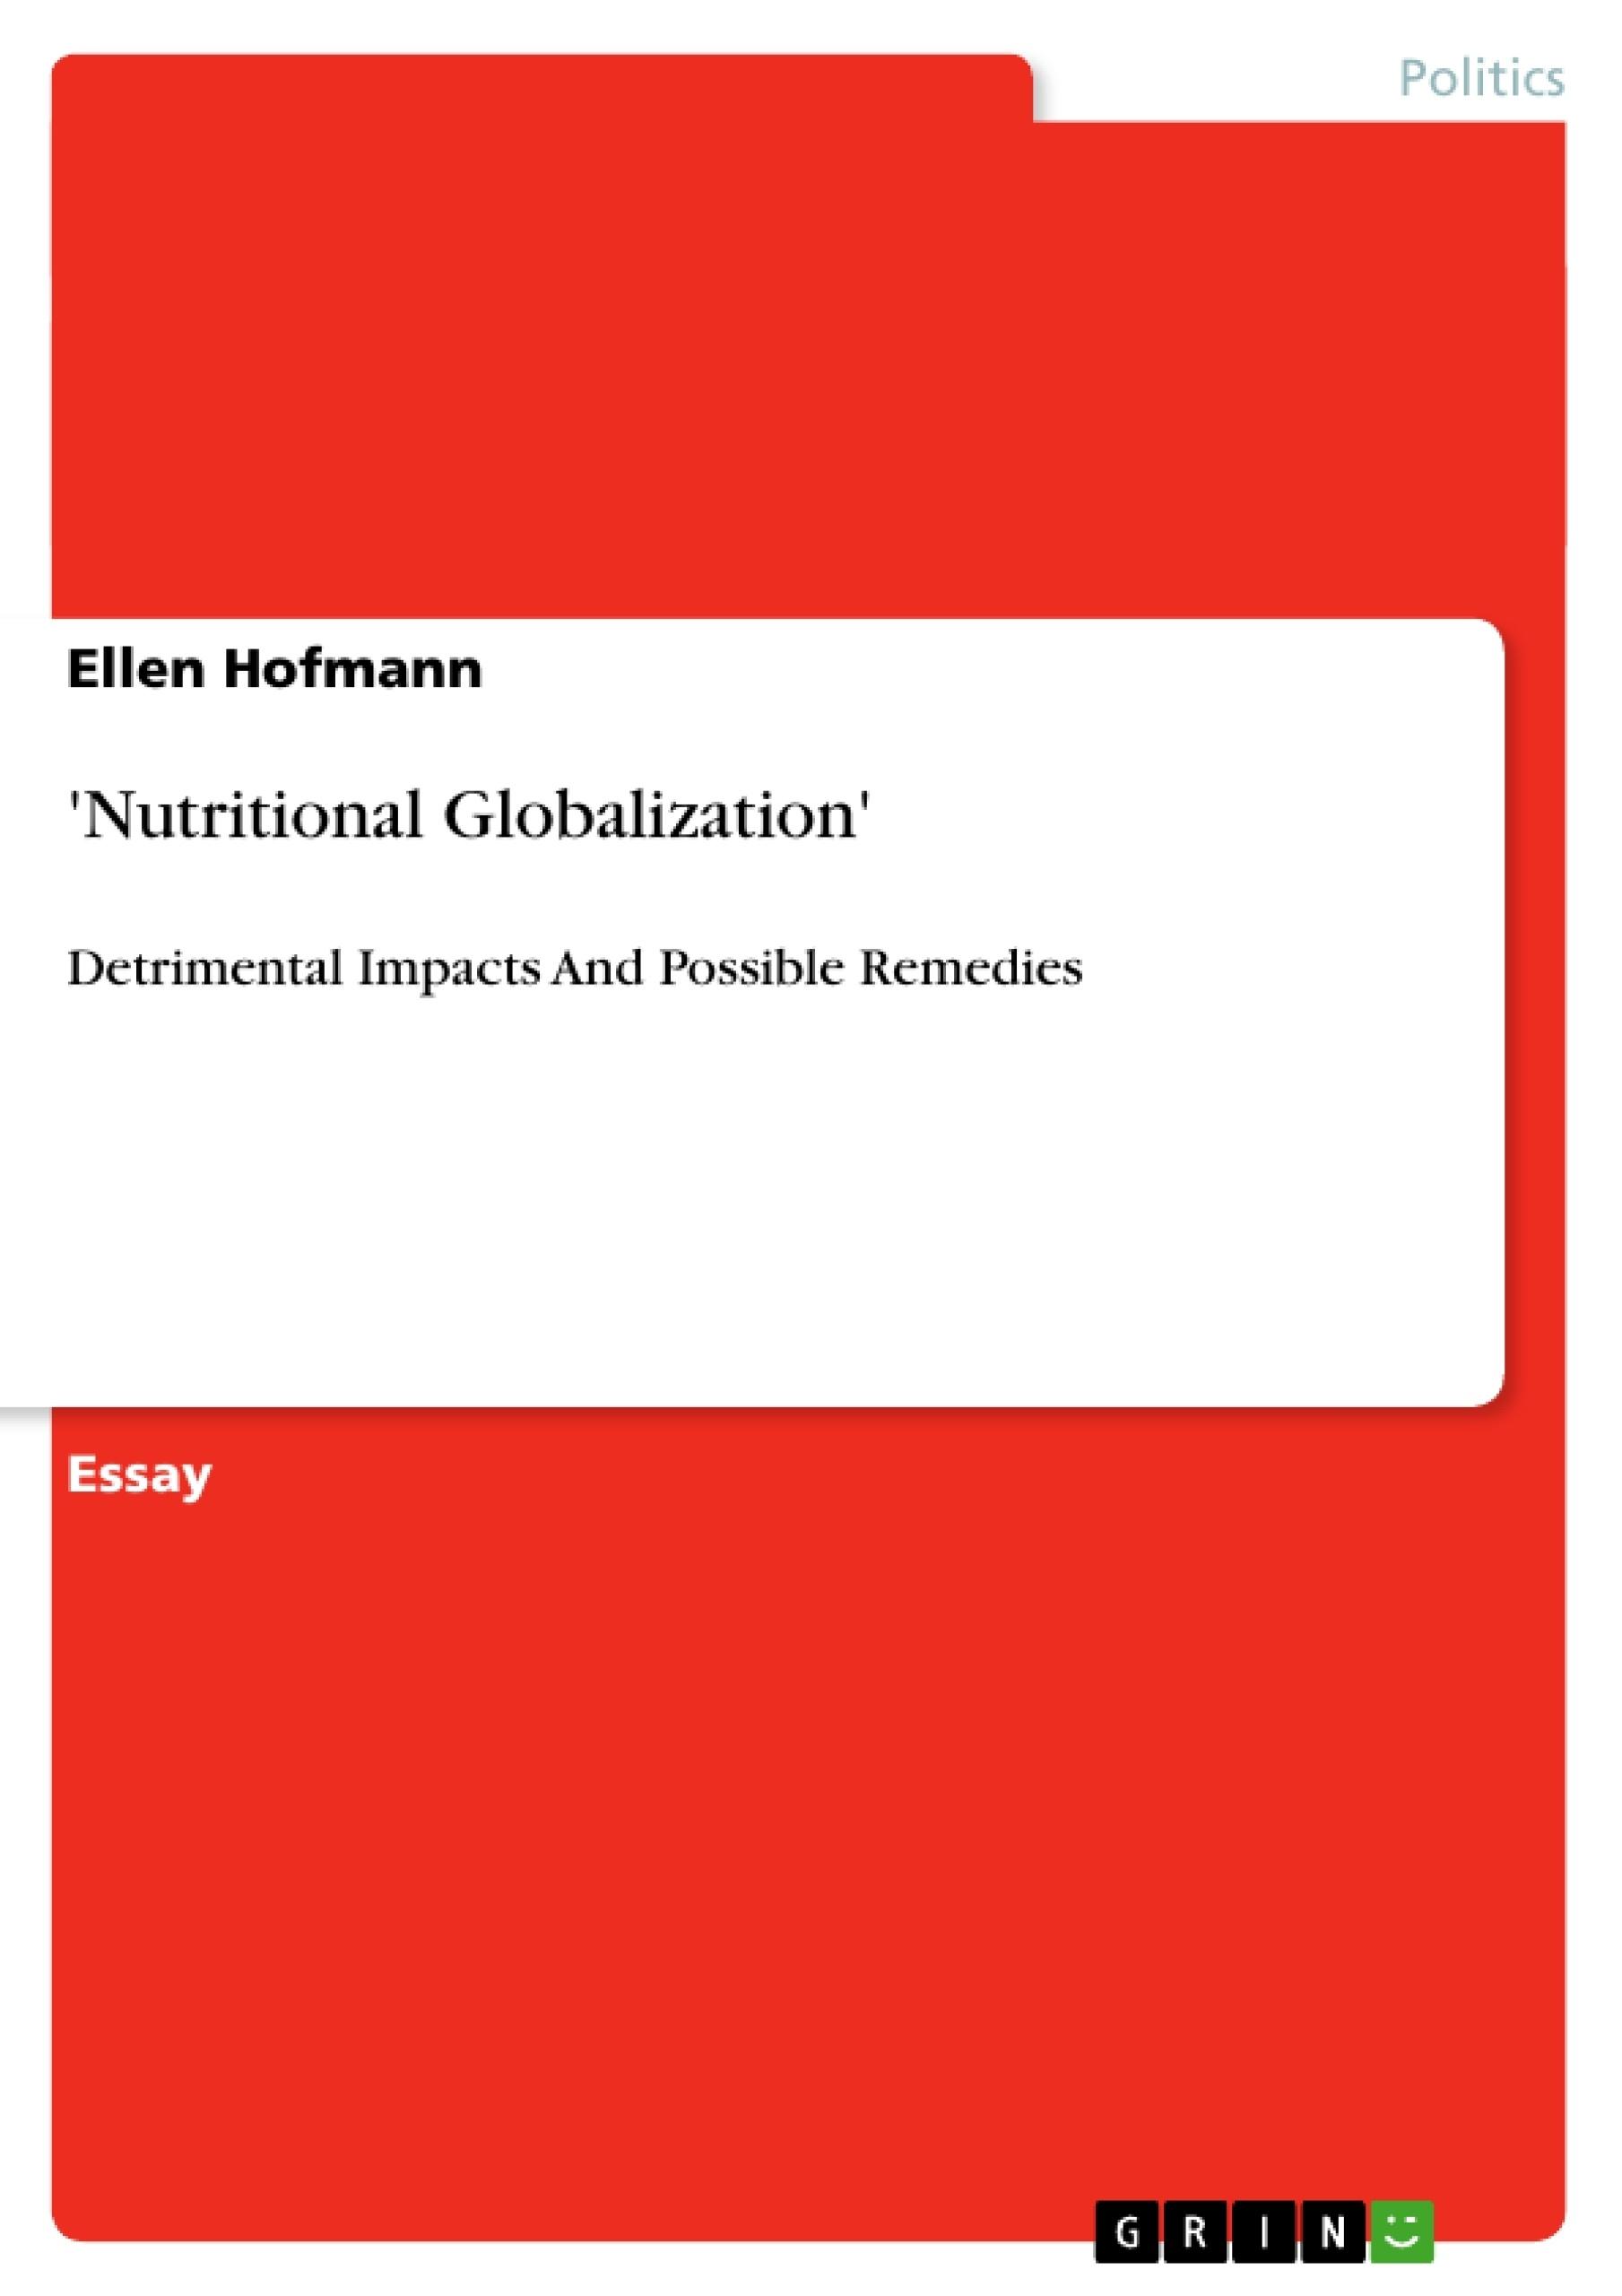 Title: 'Nutritional Globalization'